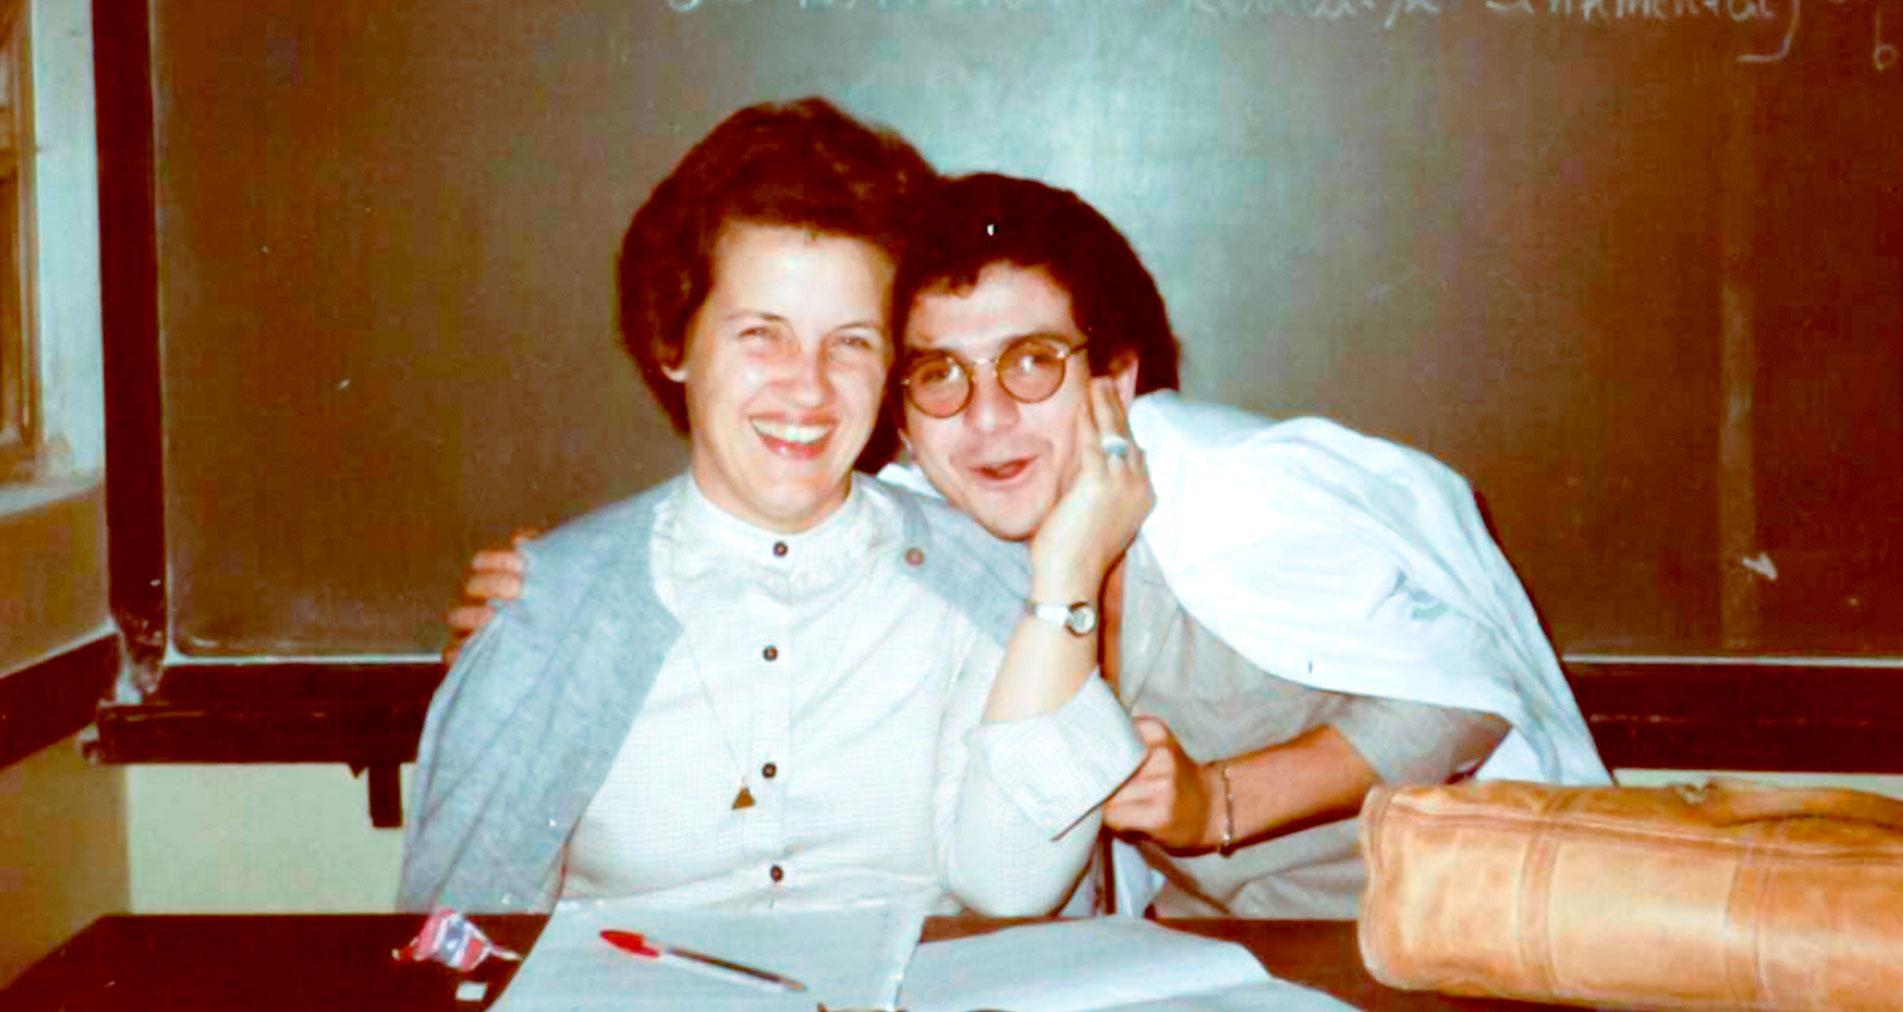 PROFESSORA - Aluno se despede de Tereza Lajolo antes de ela assumir como vereadora - Foto: Arquivo Pessoal